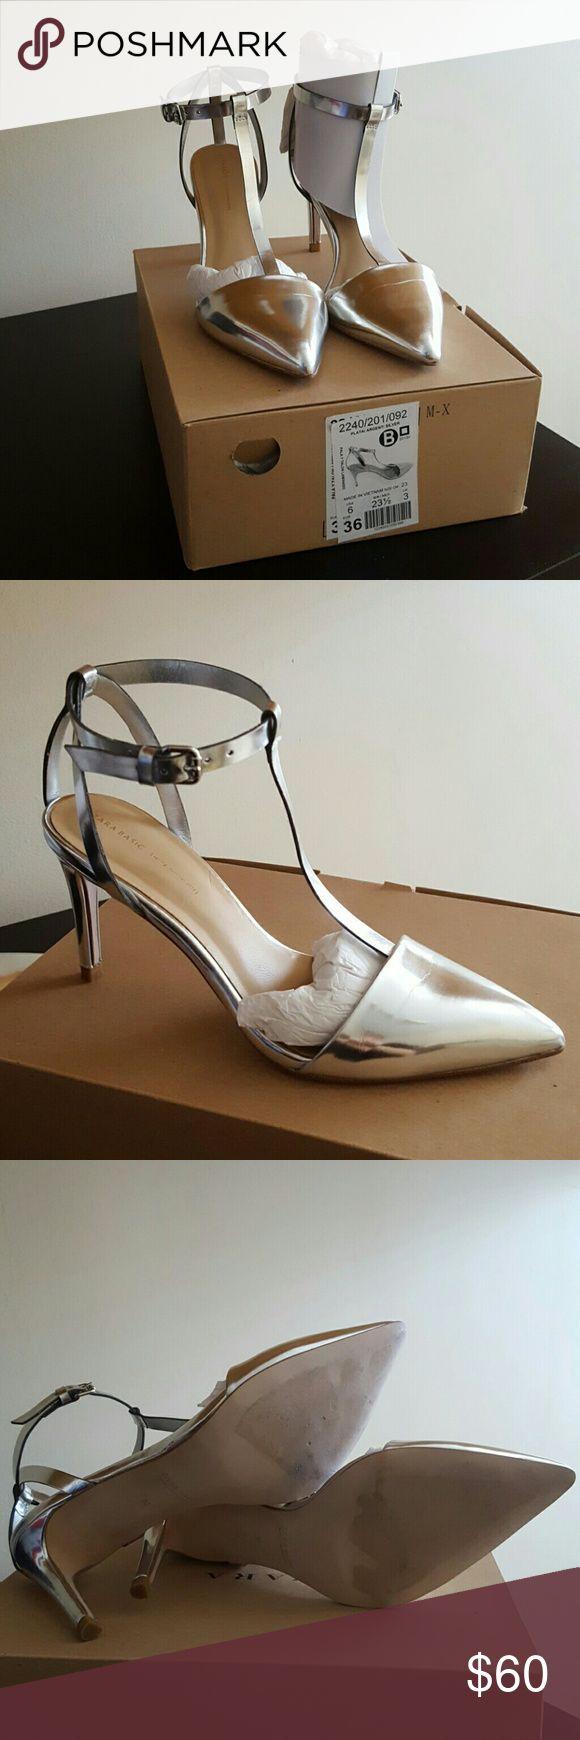 Zara Silver Metallic Strappy Heels Zara Silver Metallic Strappy Heels. Only worn once. Zara Shoes Heels